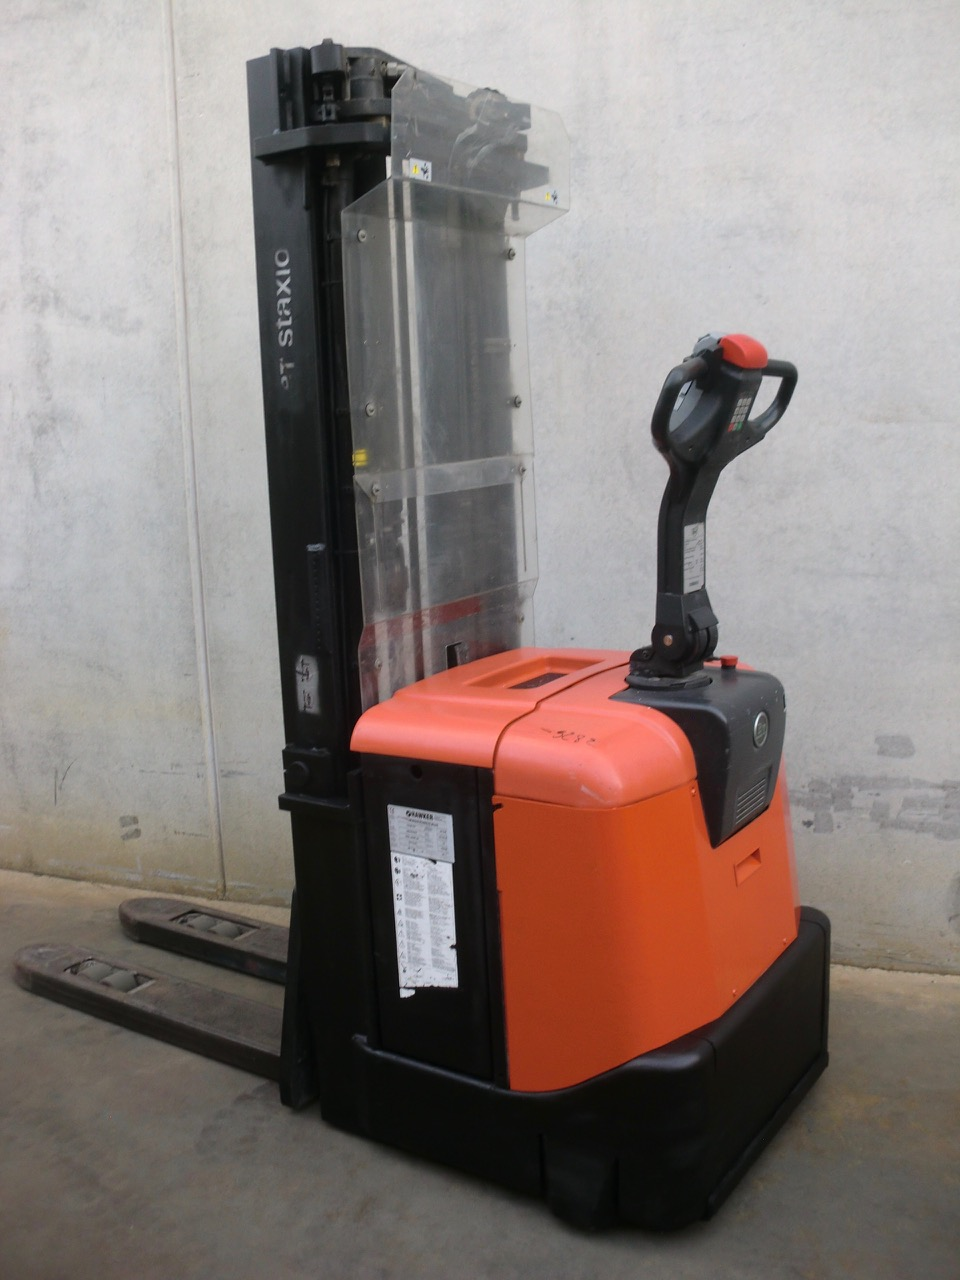 2012-bt-spe-160-385957-equipment-cover-image